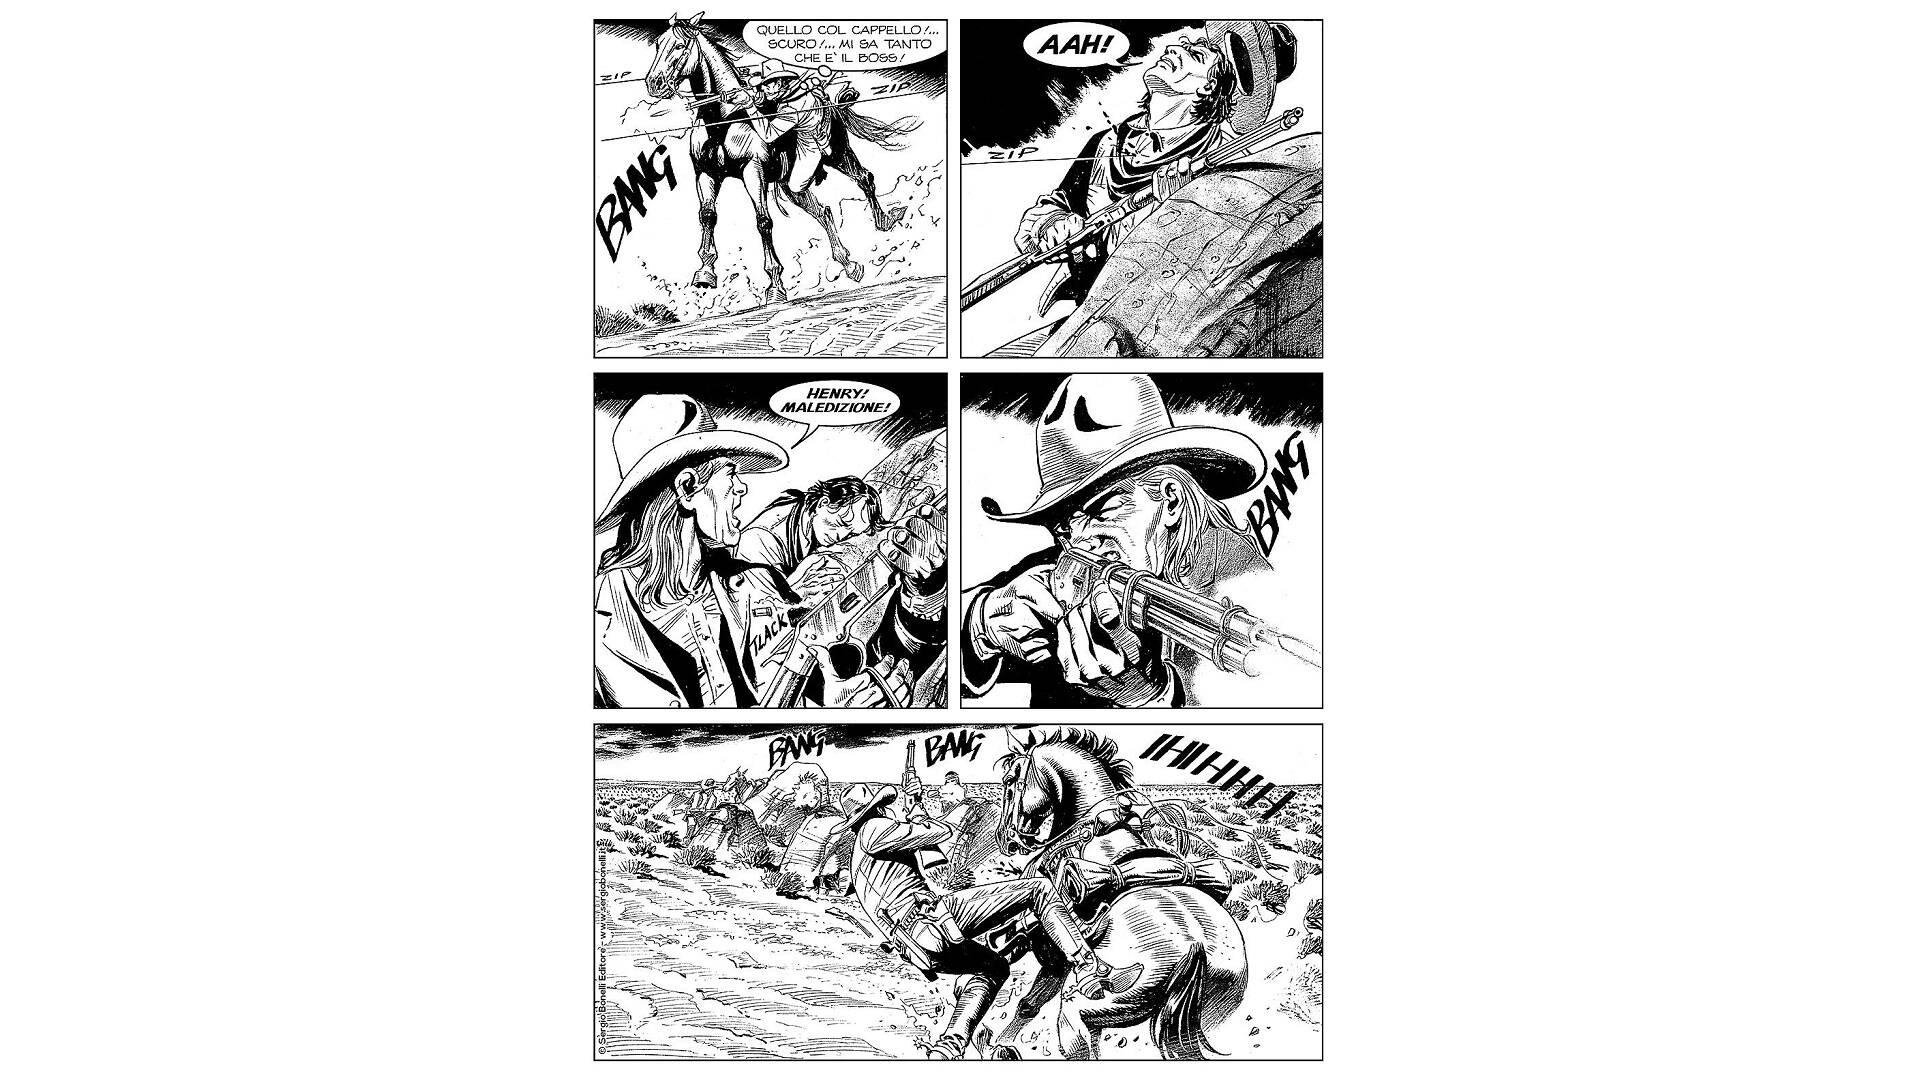 Tex 729 Bis - Agente Indiano, la recensione